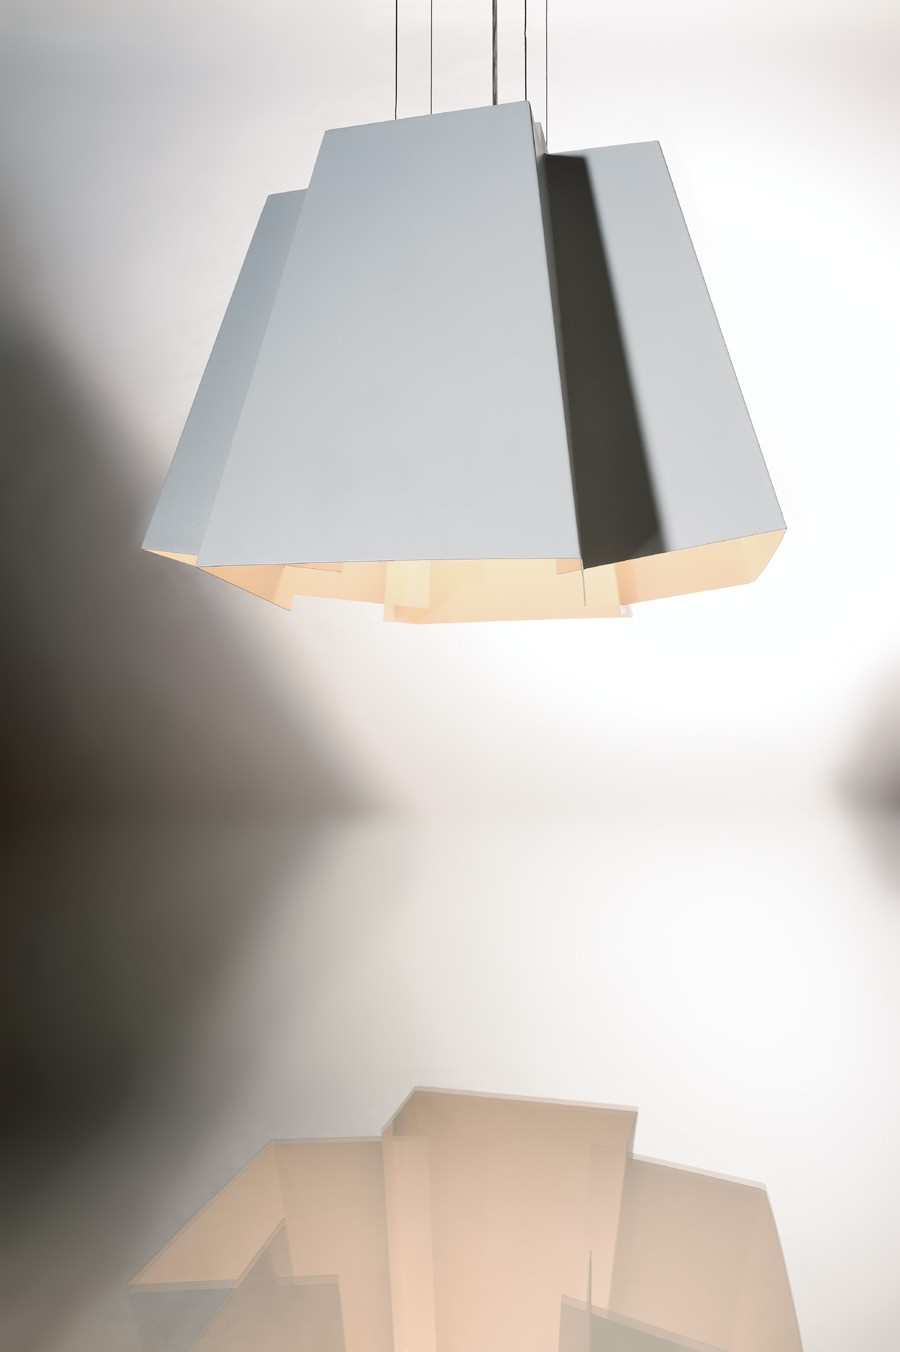 eurolighting products suspended decorative luminaire. Black Bedroom Furniture Sets. Home Design Ideas